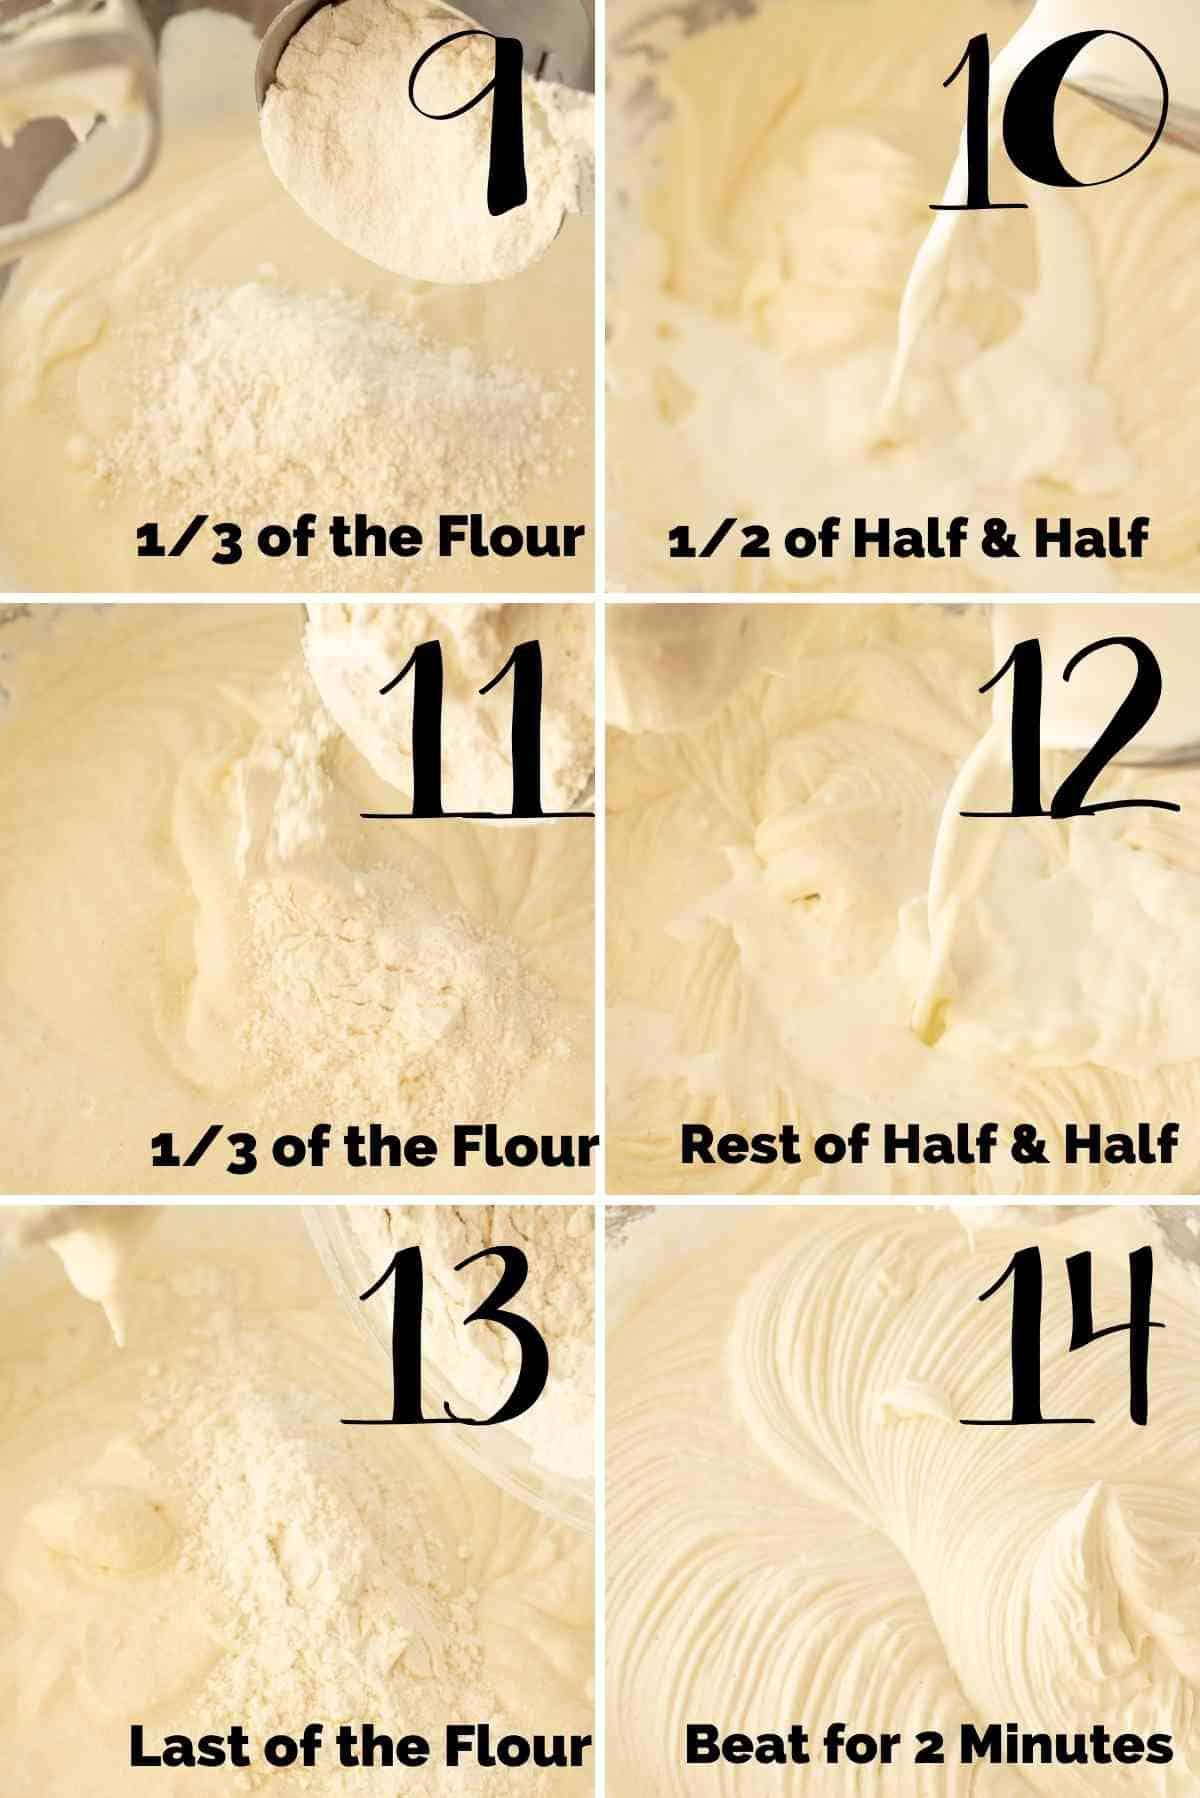 Additions of flour and half & half.